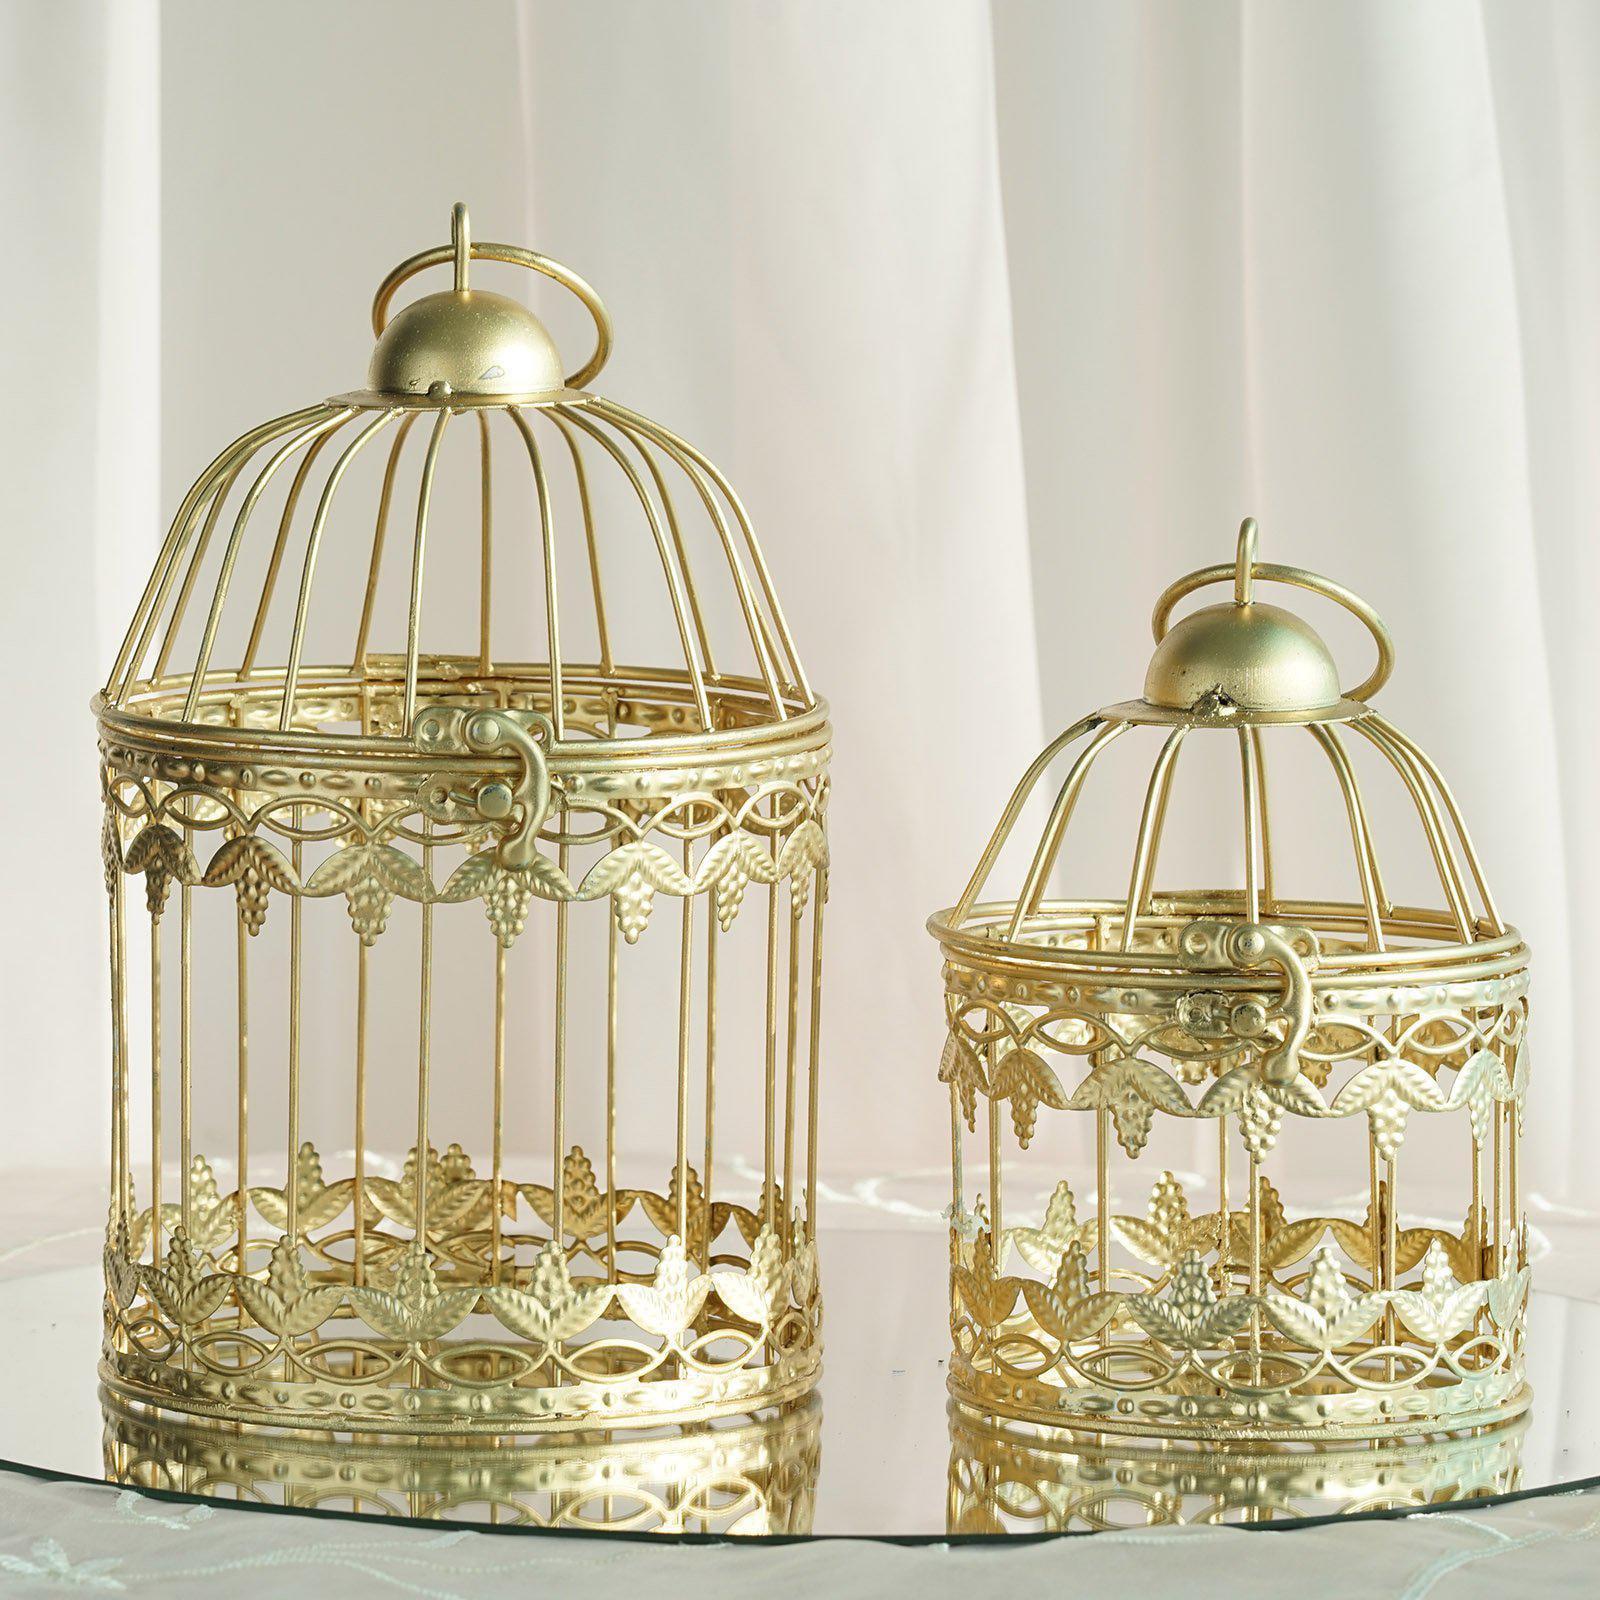 Set Of 2 7 And 9 Metallic Gold Bird Cage Card Holders Walmart Com Walmart Com